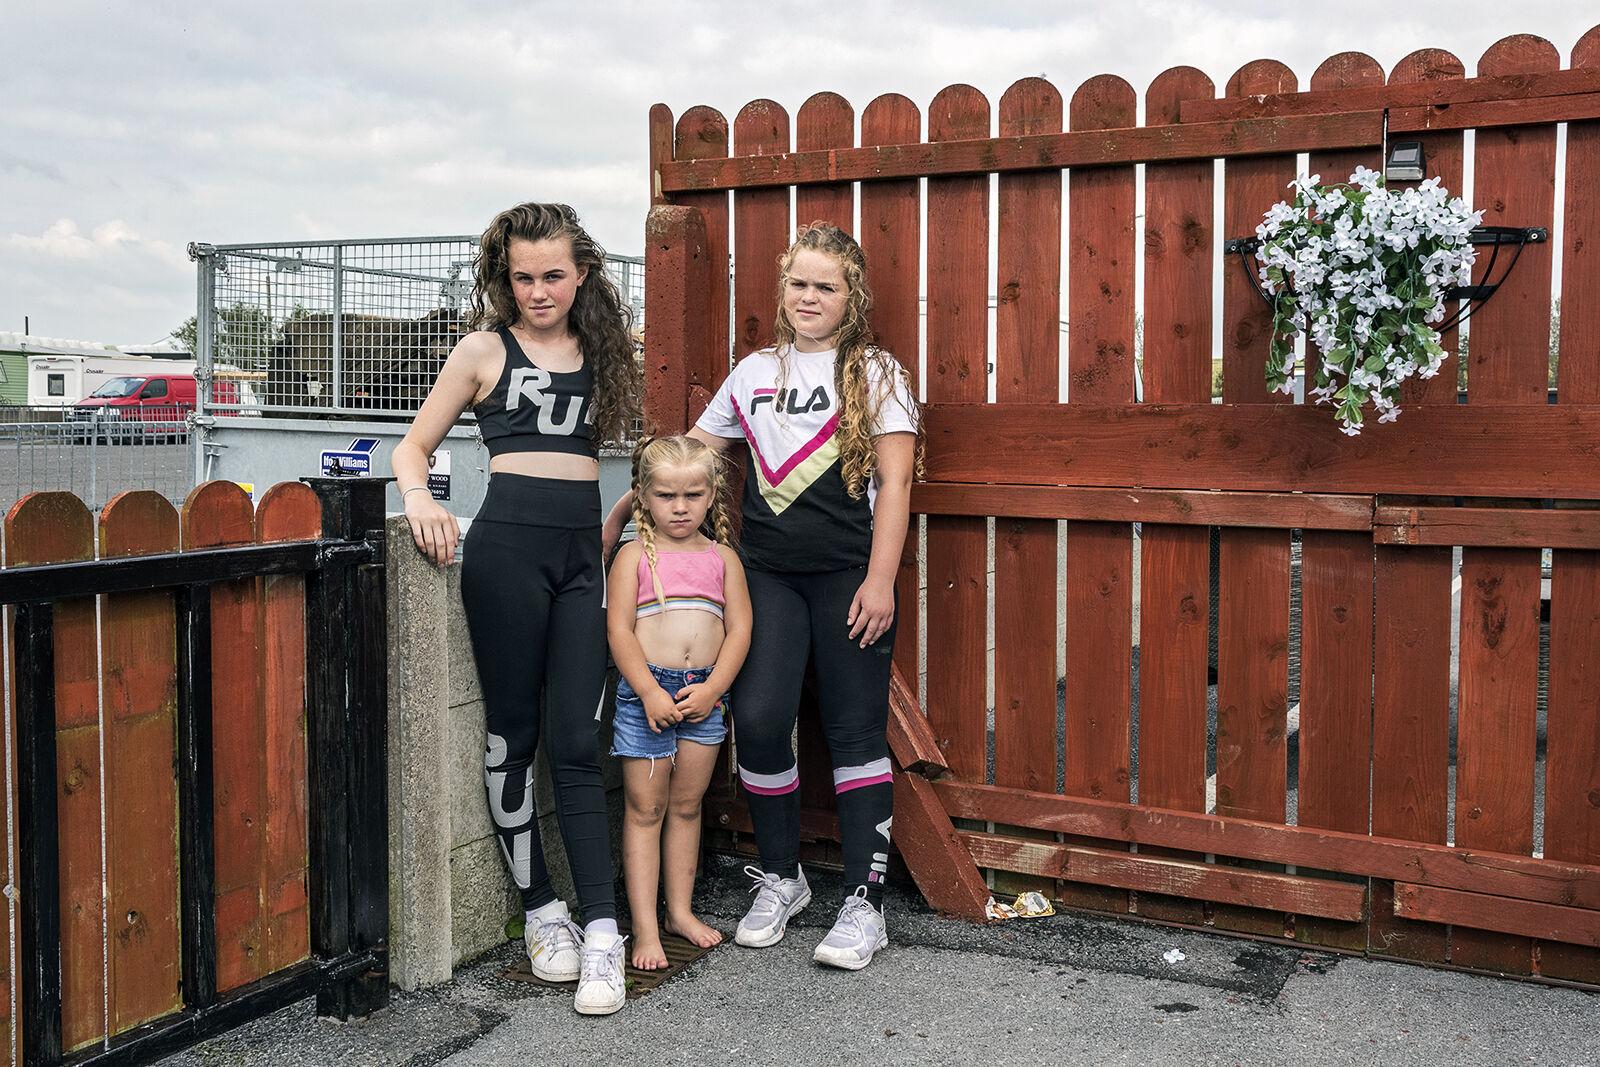 Barrett Sisters, Galway, Ireland 2020